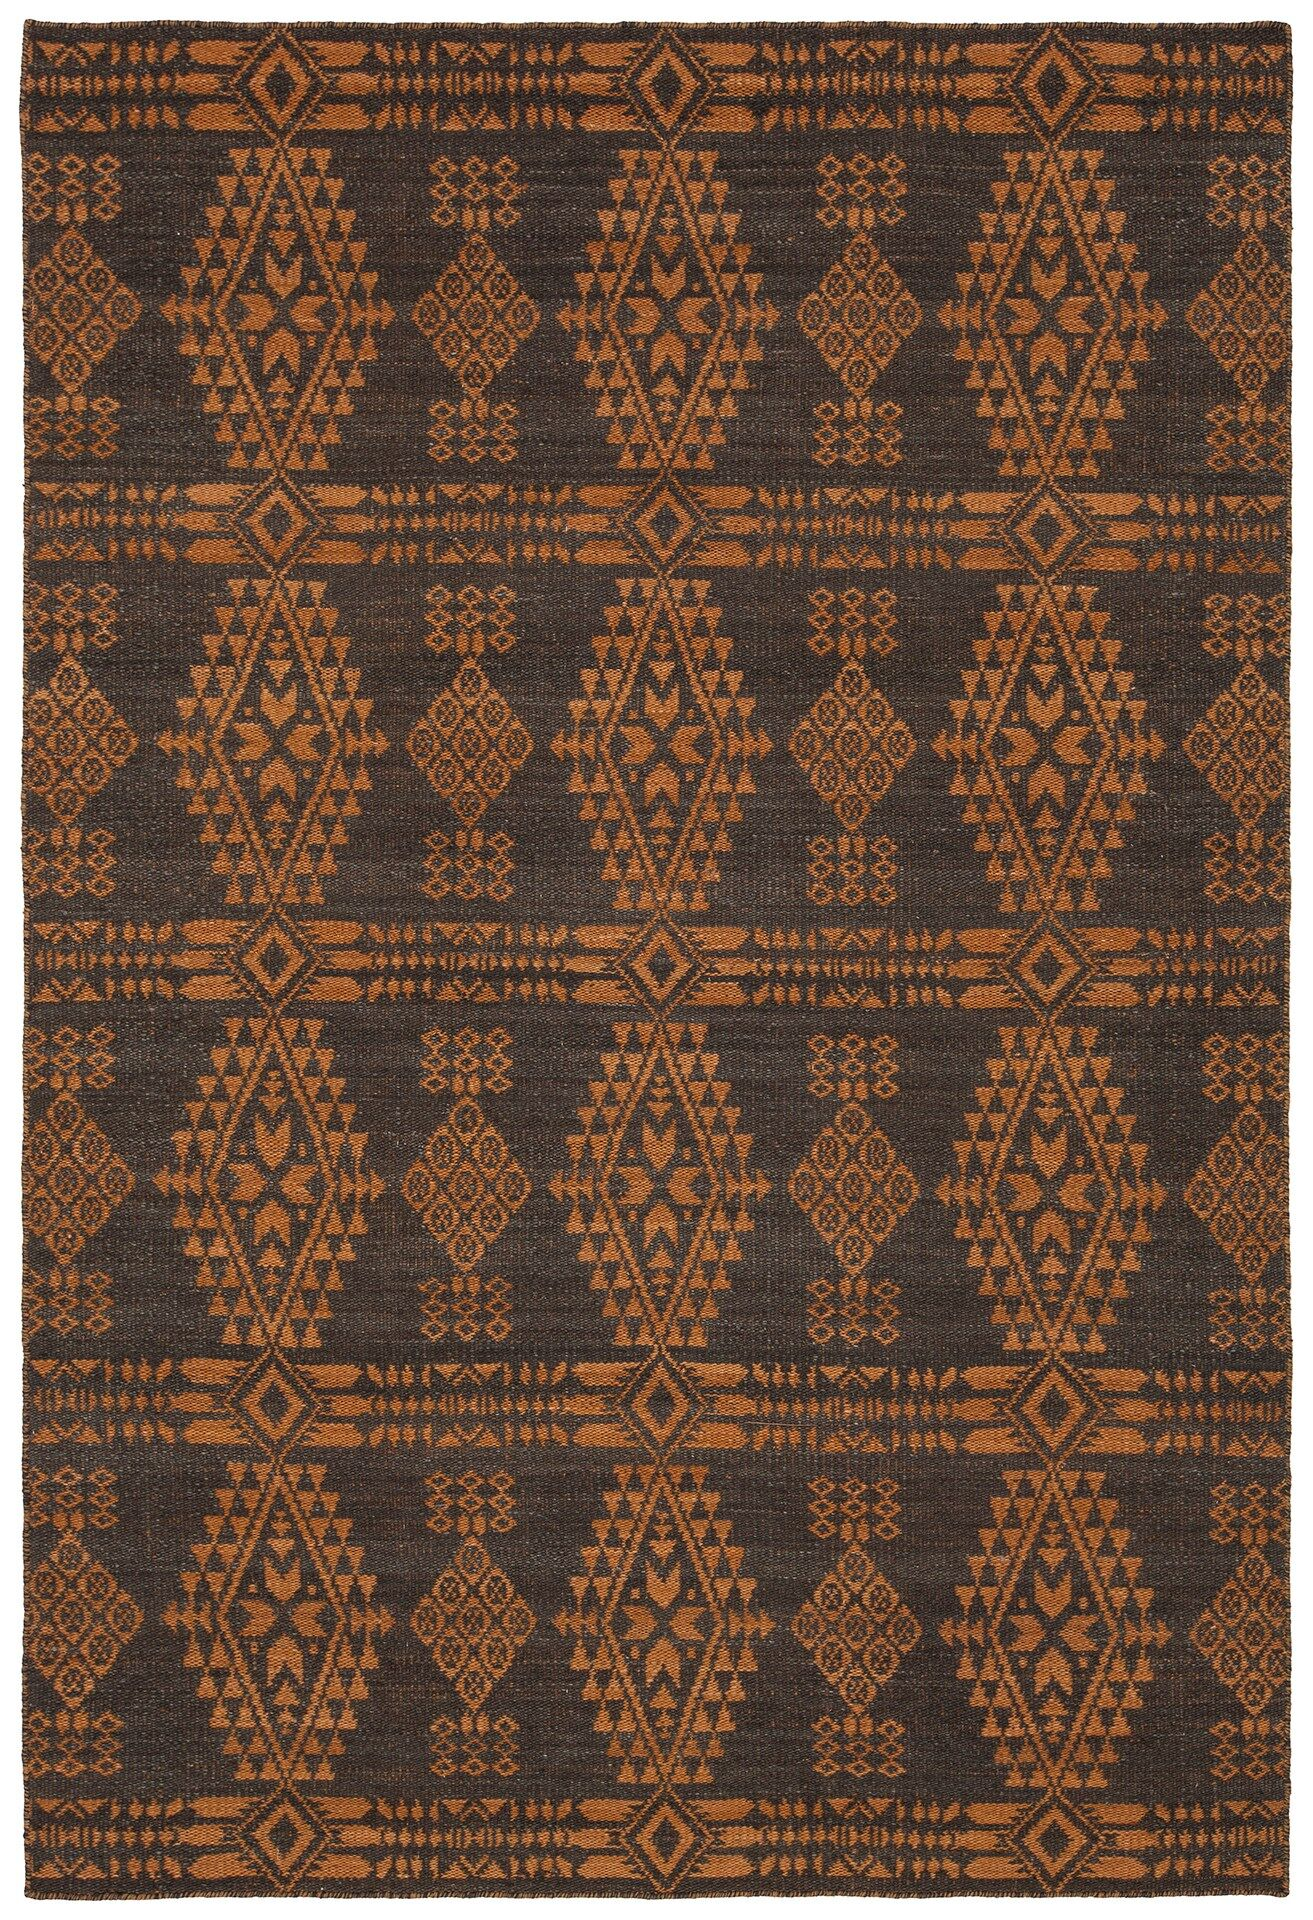 Daria Hand-Woven Wool Orange Area Rug Rug Size: Rectangle 7'9